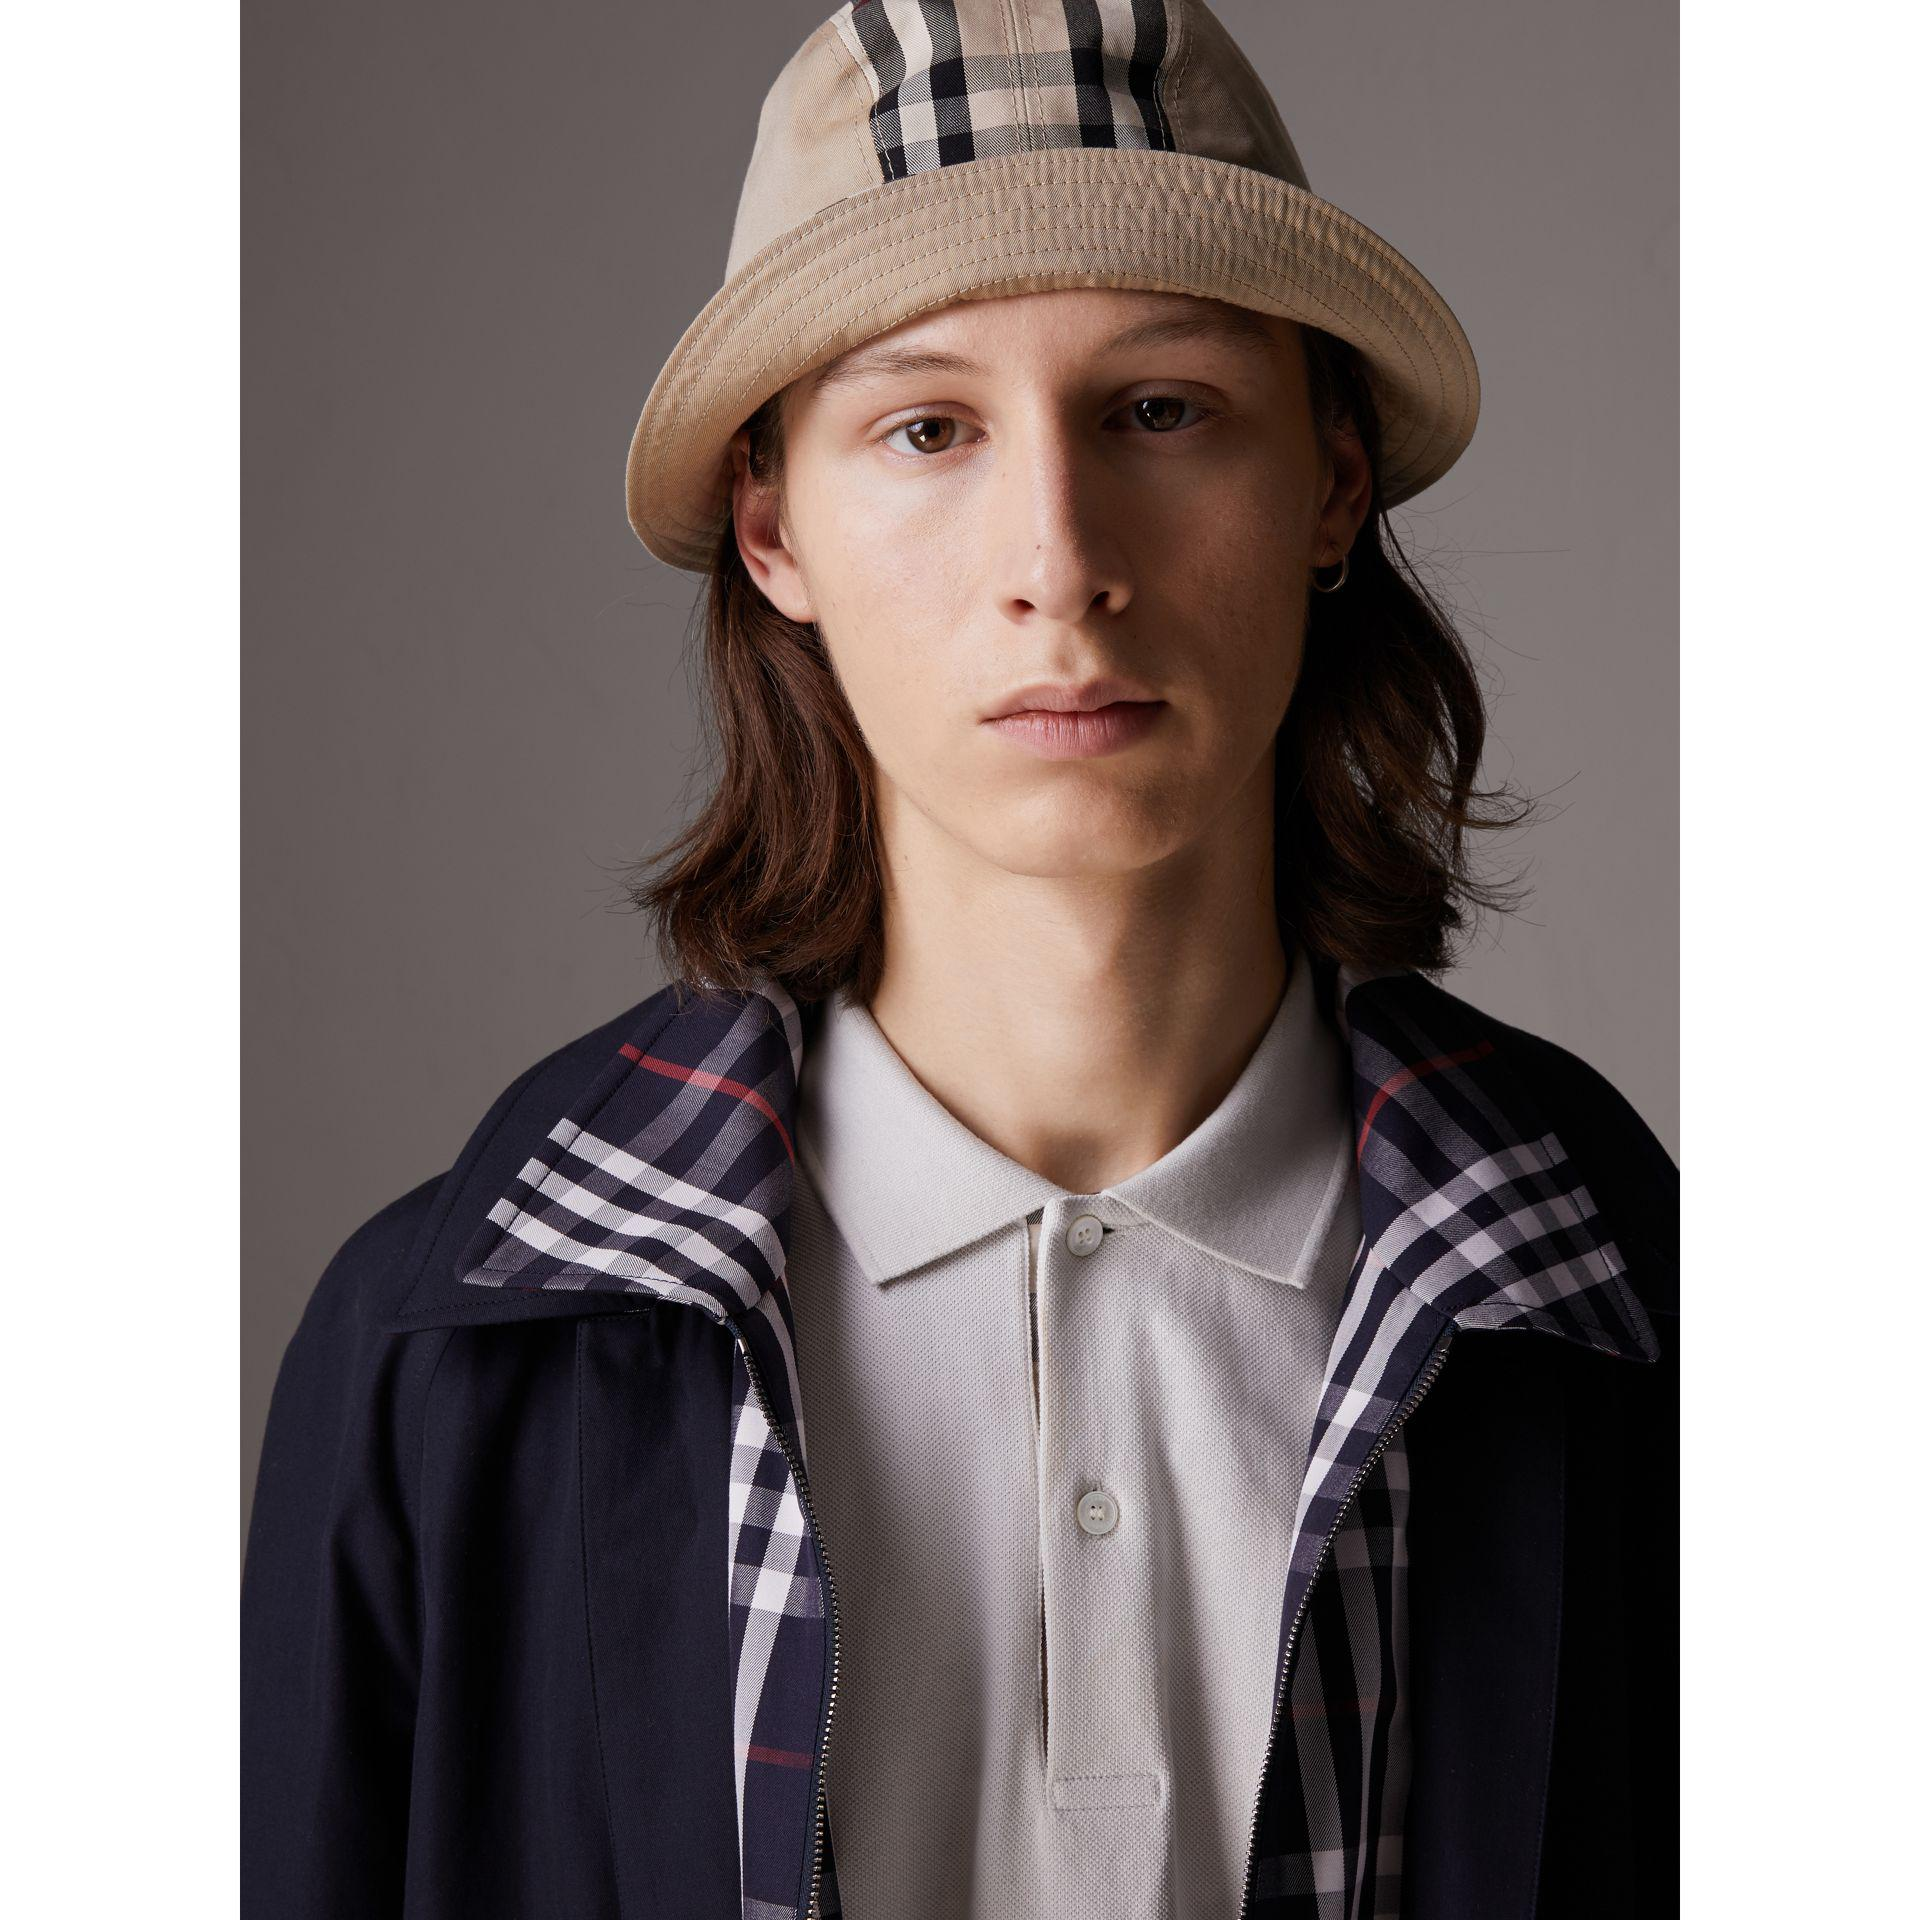 Lyst - Burberry Gosha X Bucket Hat for Men 60f4e74467e